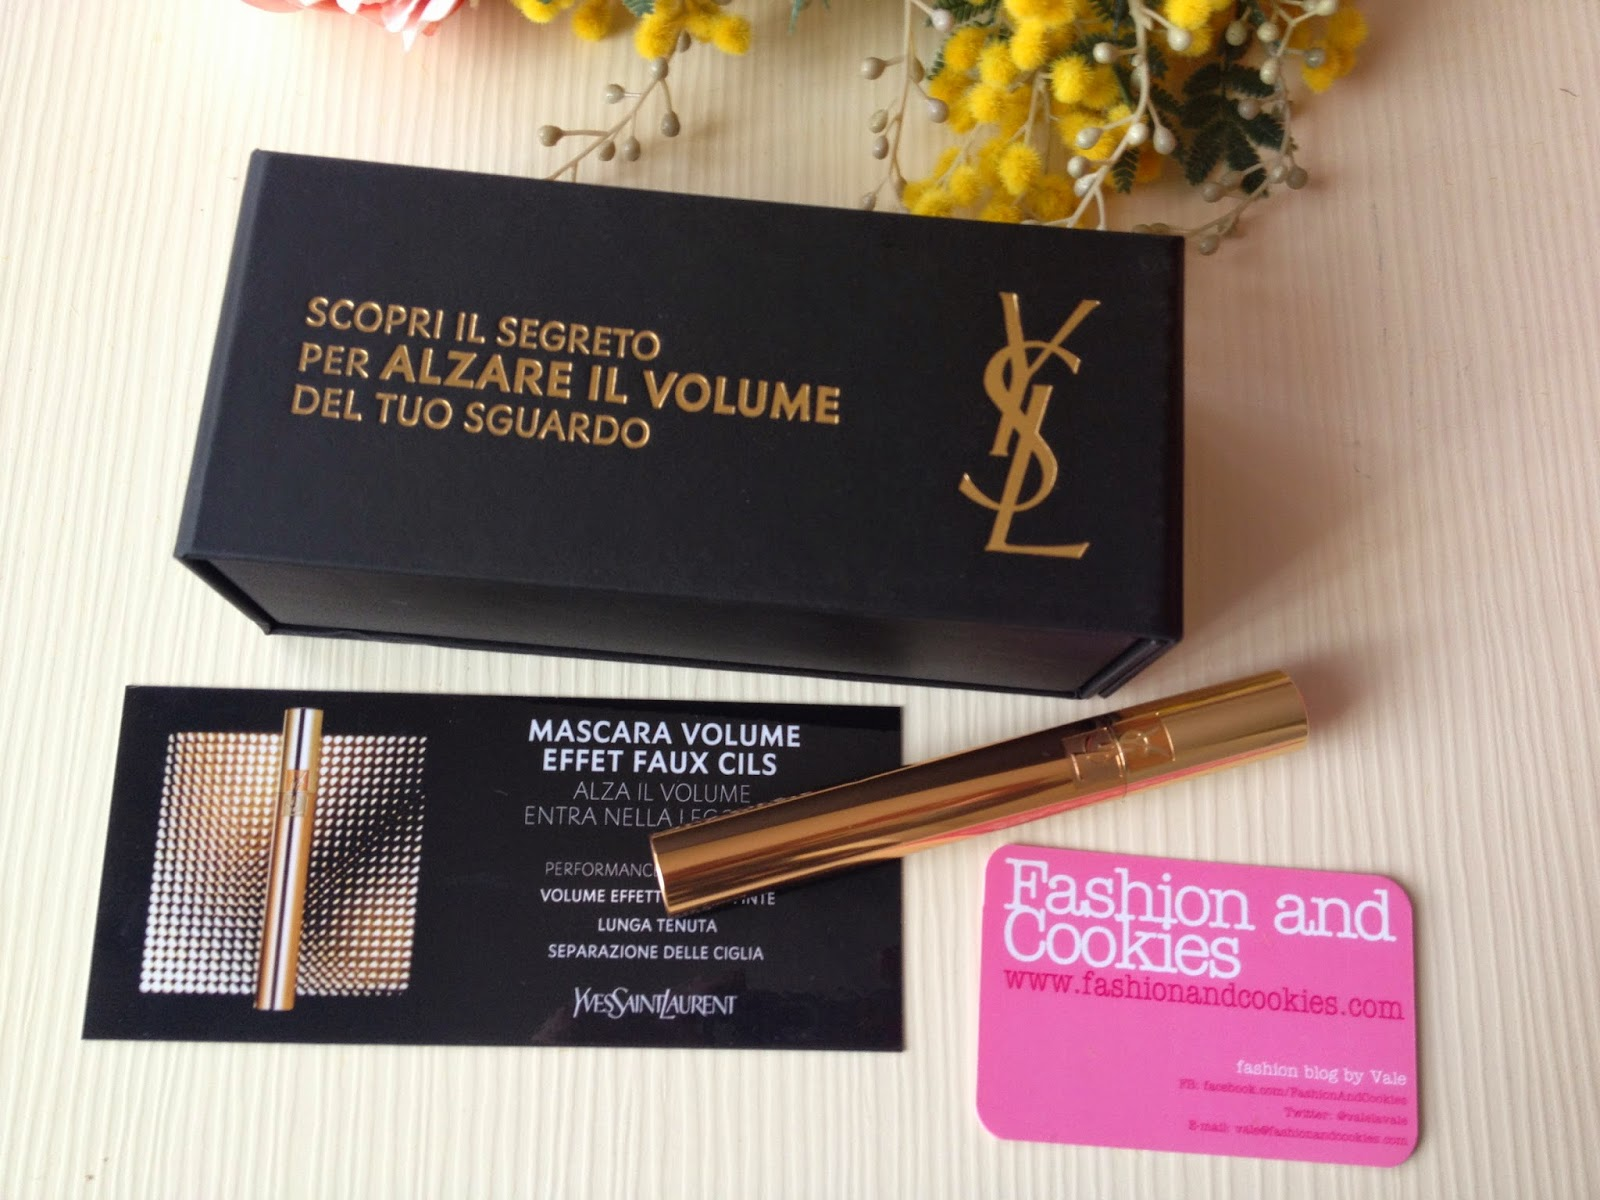 YSL new mascara, YSL Volume Effet Faux Lashes Mascara, Fashion and Cookies fashion blog,  fashion blogger,  YSL mascara review